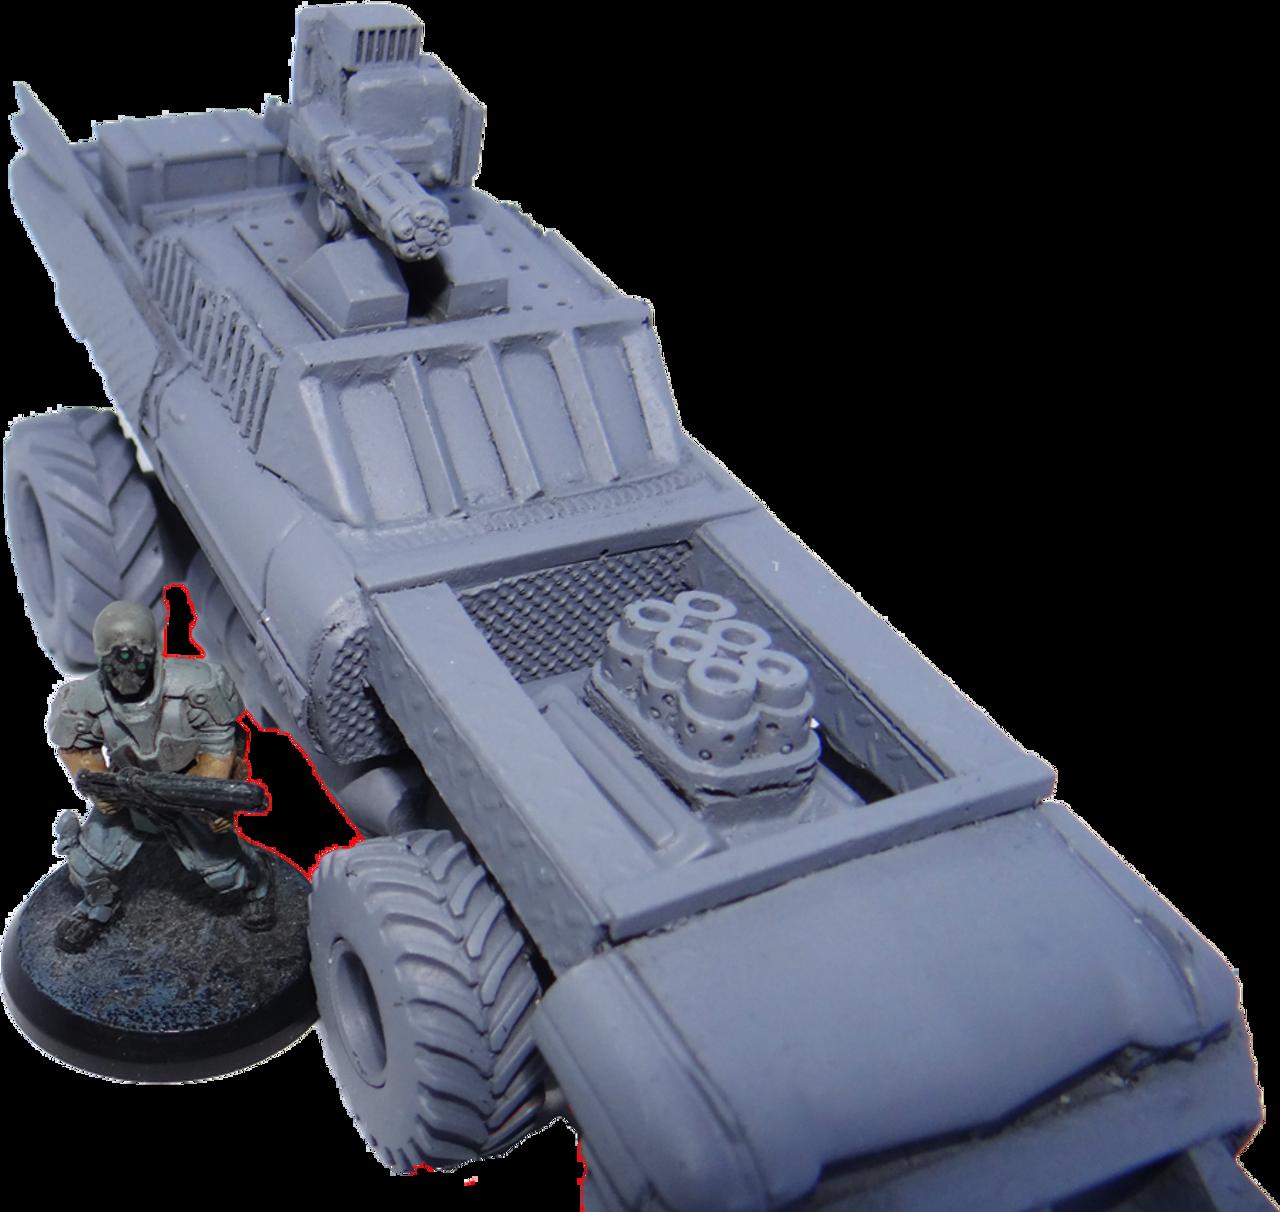 1225 -Zombie Slayer Vehicle